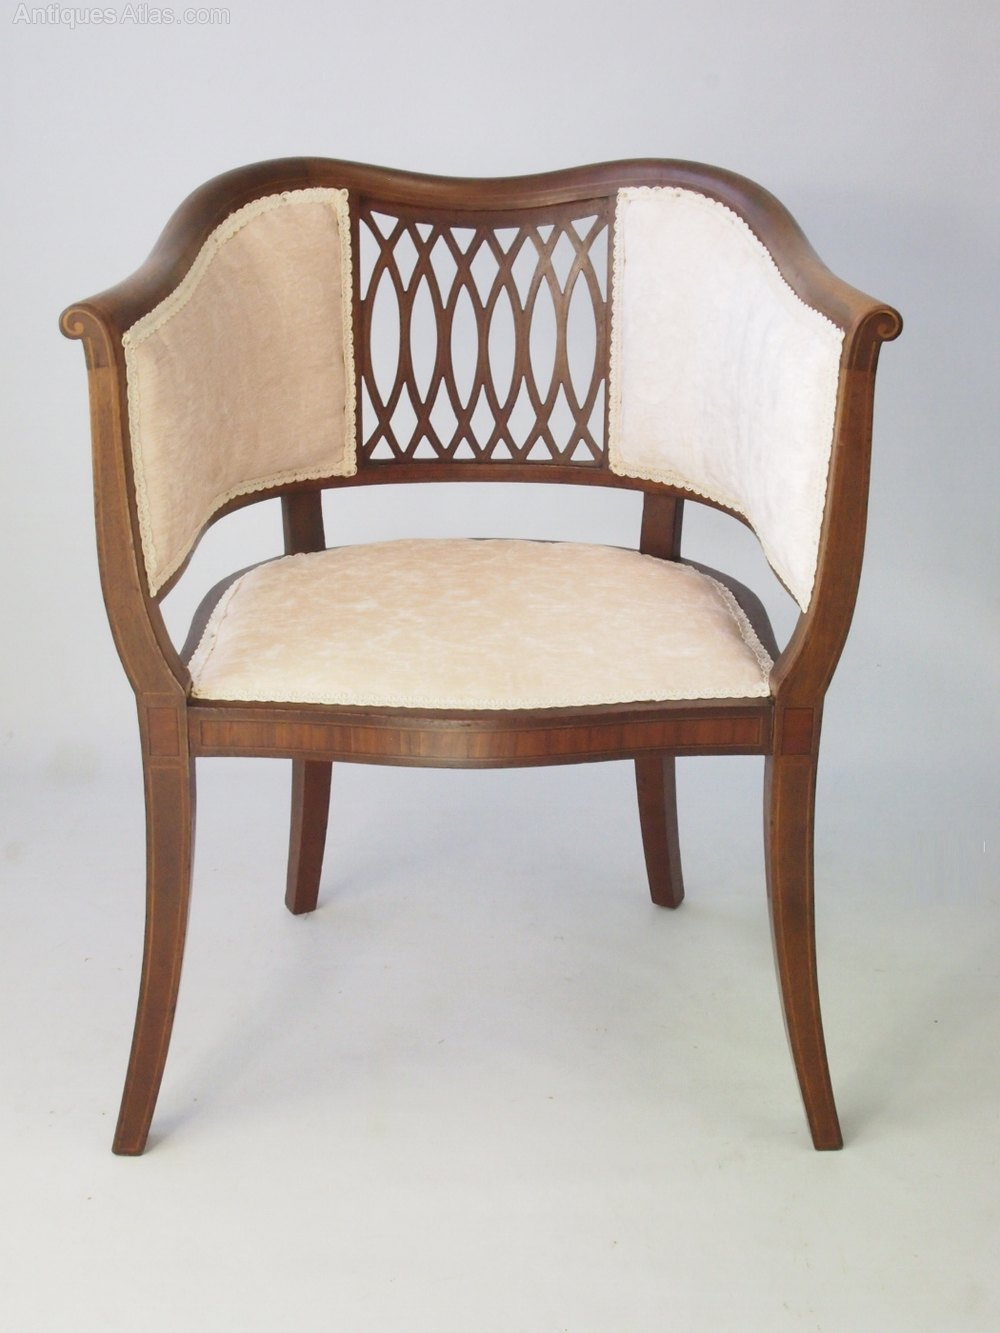 Patterned Tub Chairs Antique Edwardian Mahogany Tub Chair